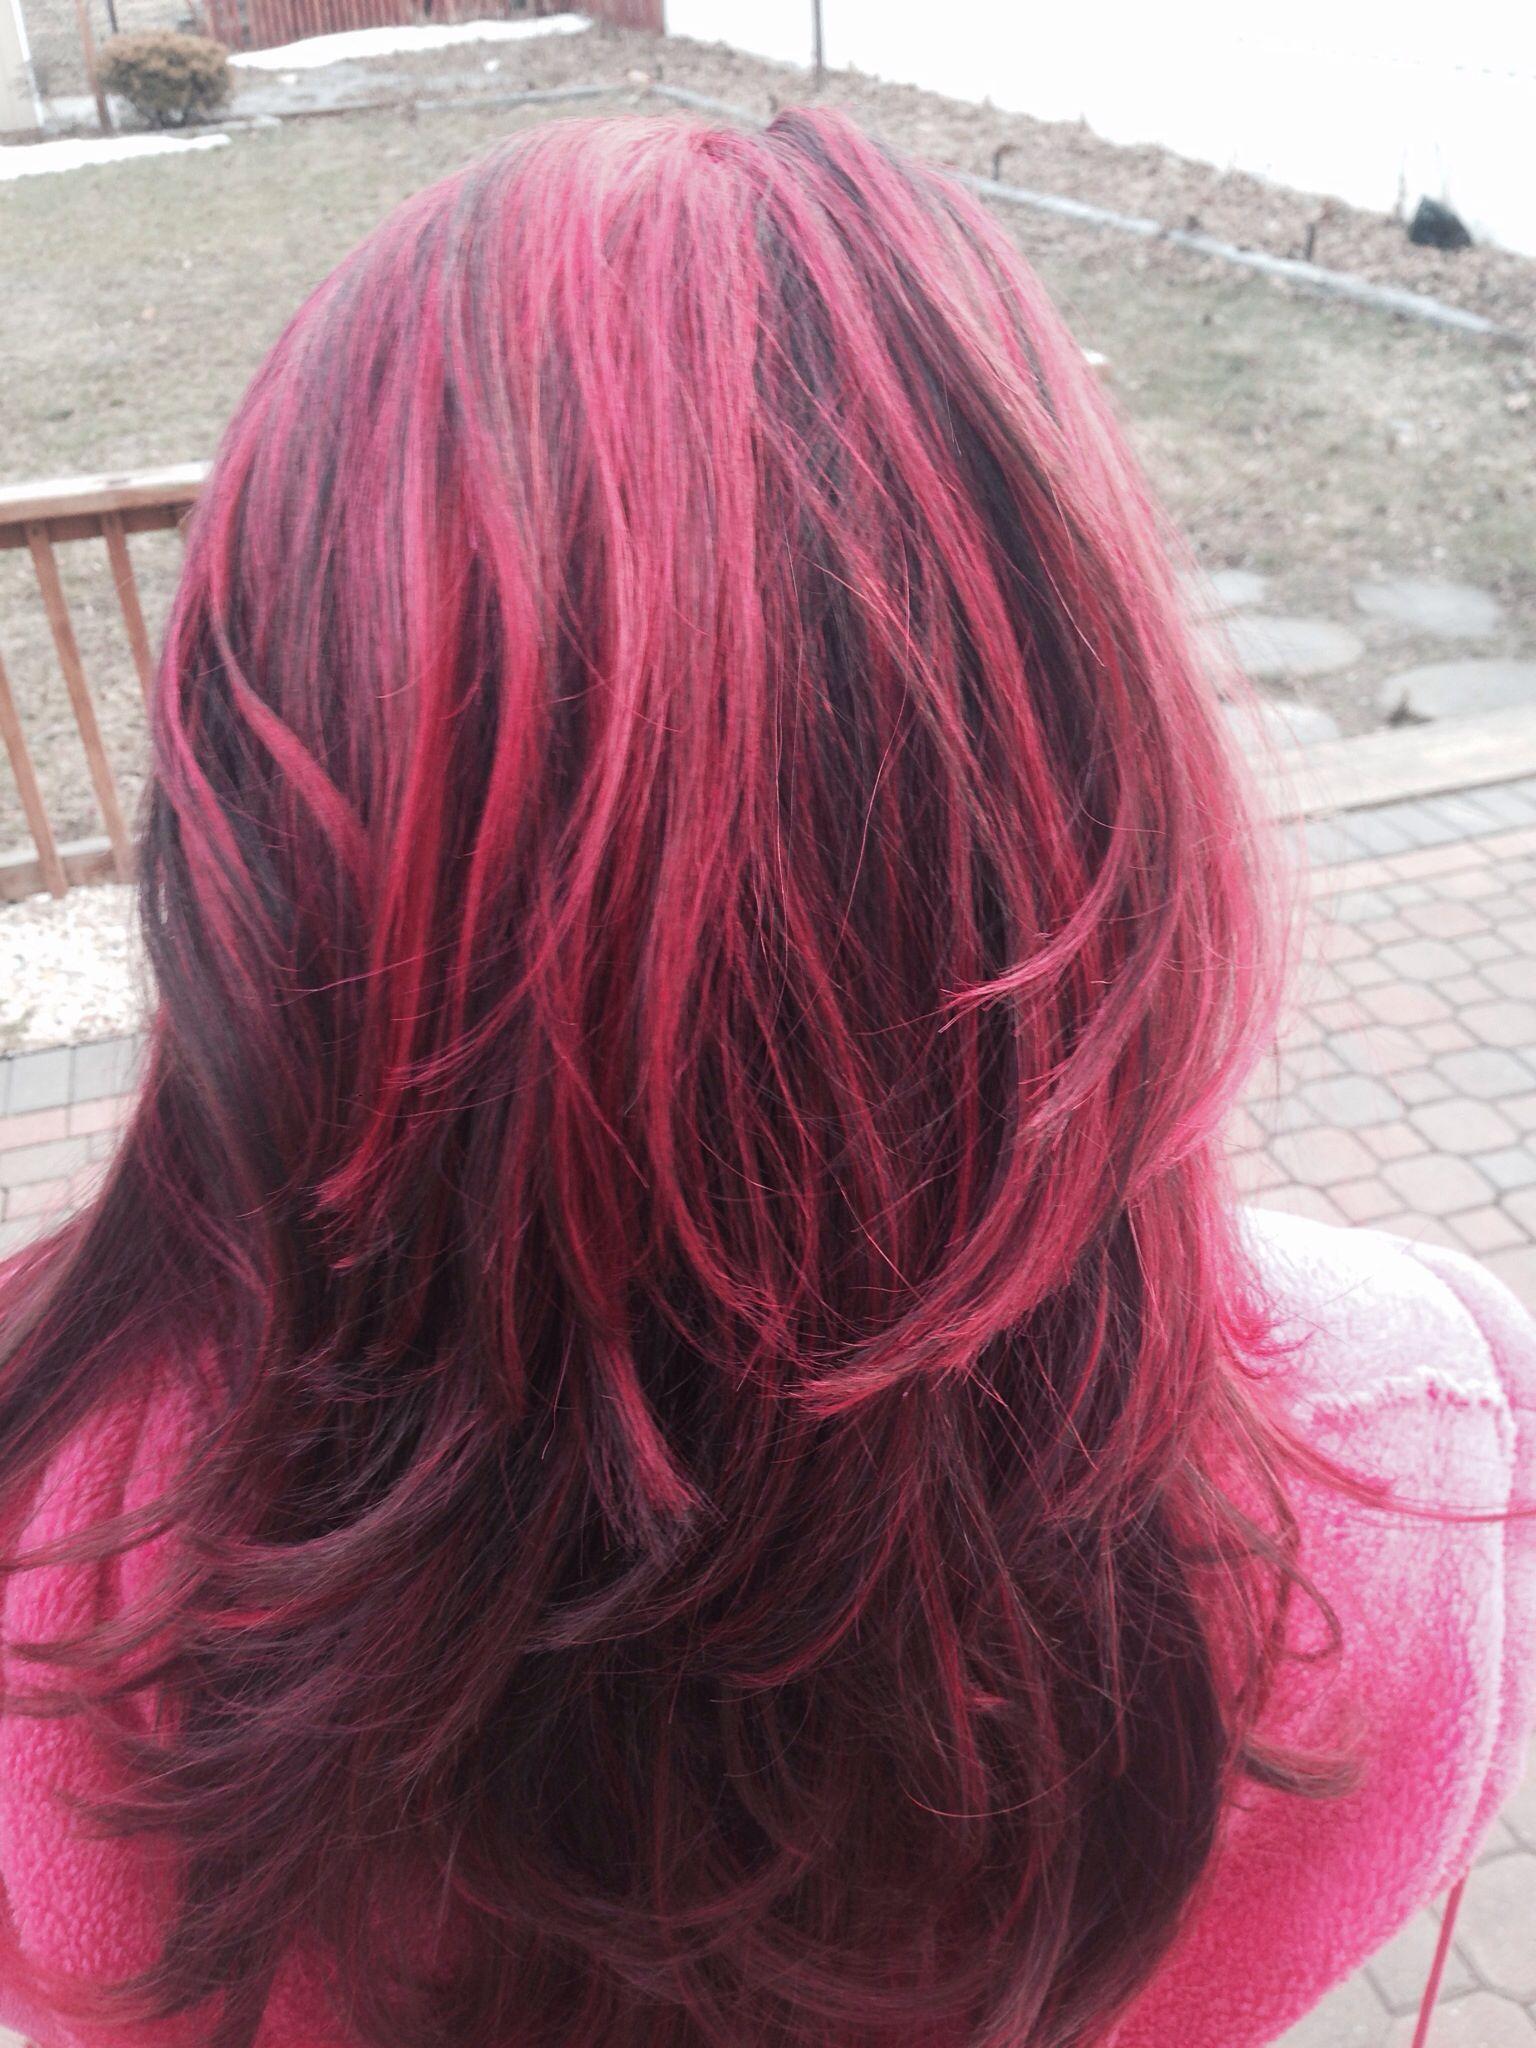 Pink Highlights On Brown Hair Hair In 2018 Pinterest Hair